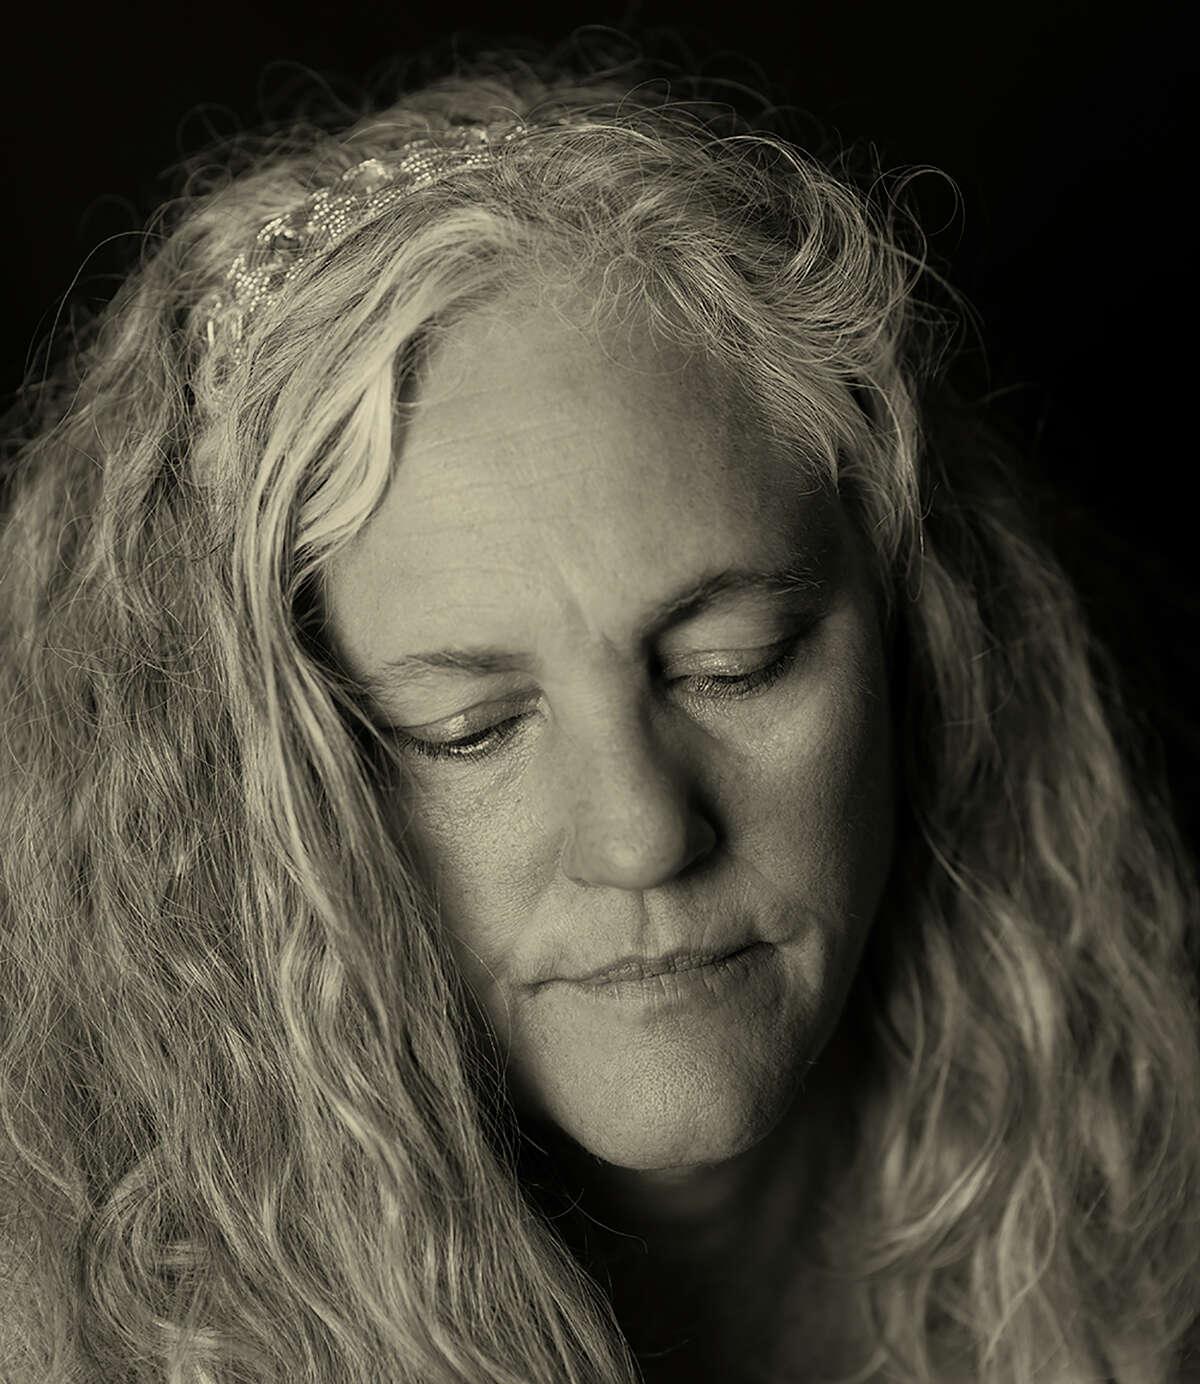 Lauren Browning is one of the artists in Ramin Samandari's